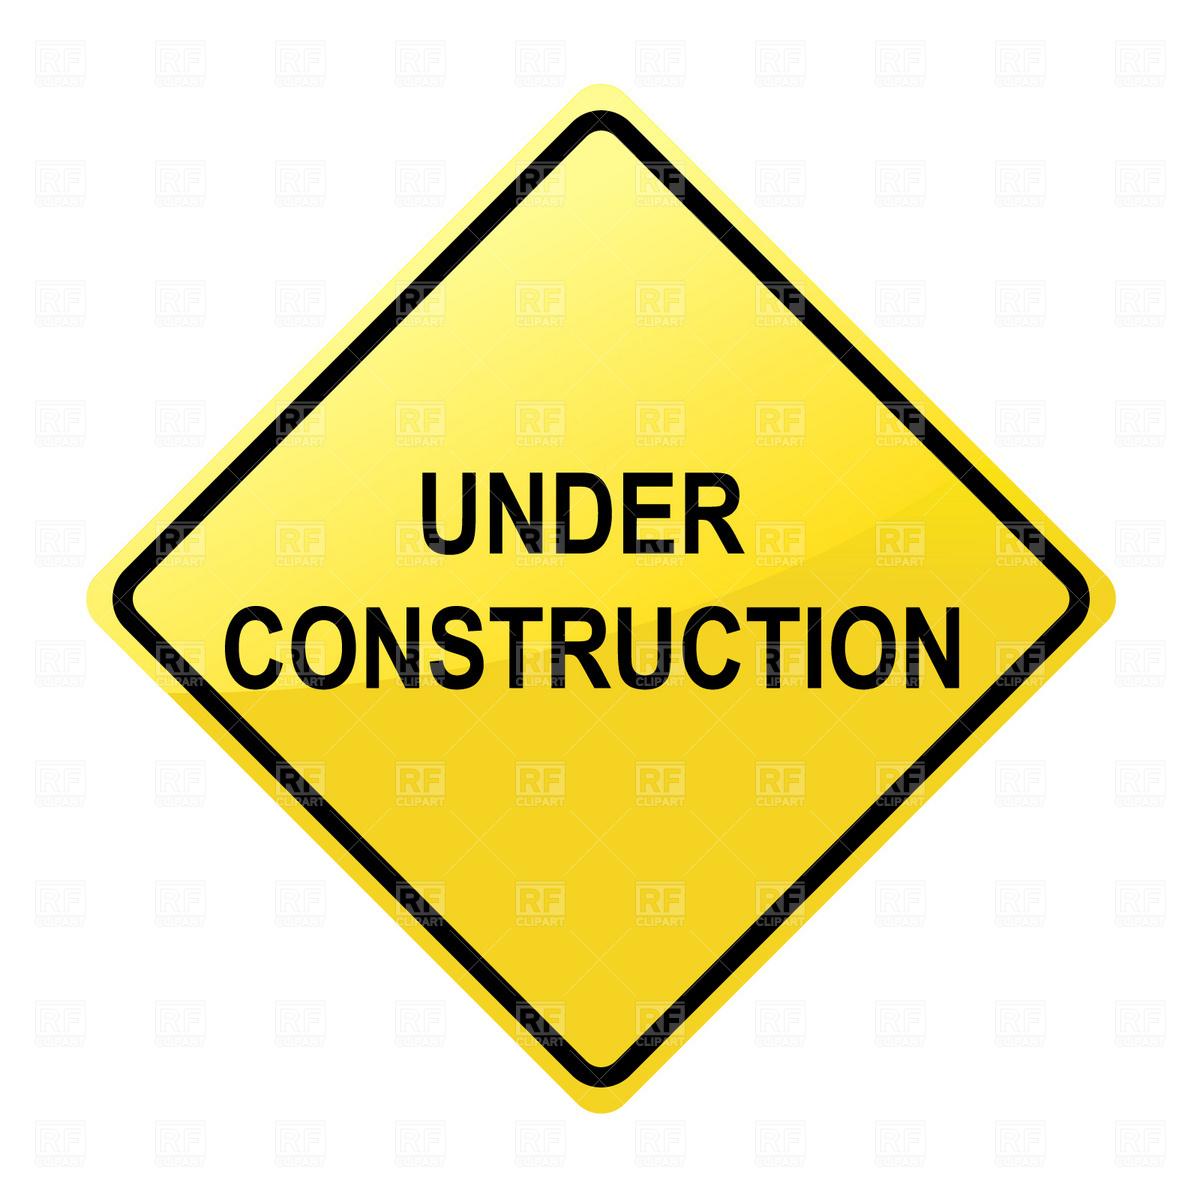 Under construction sign clip art.